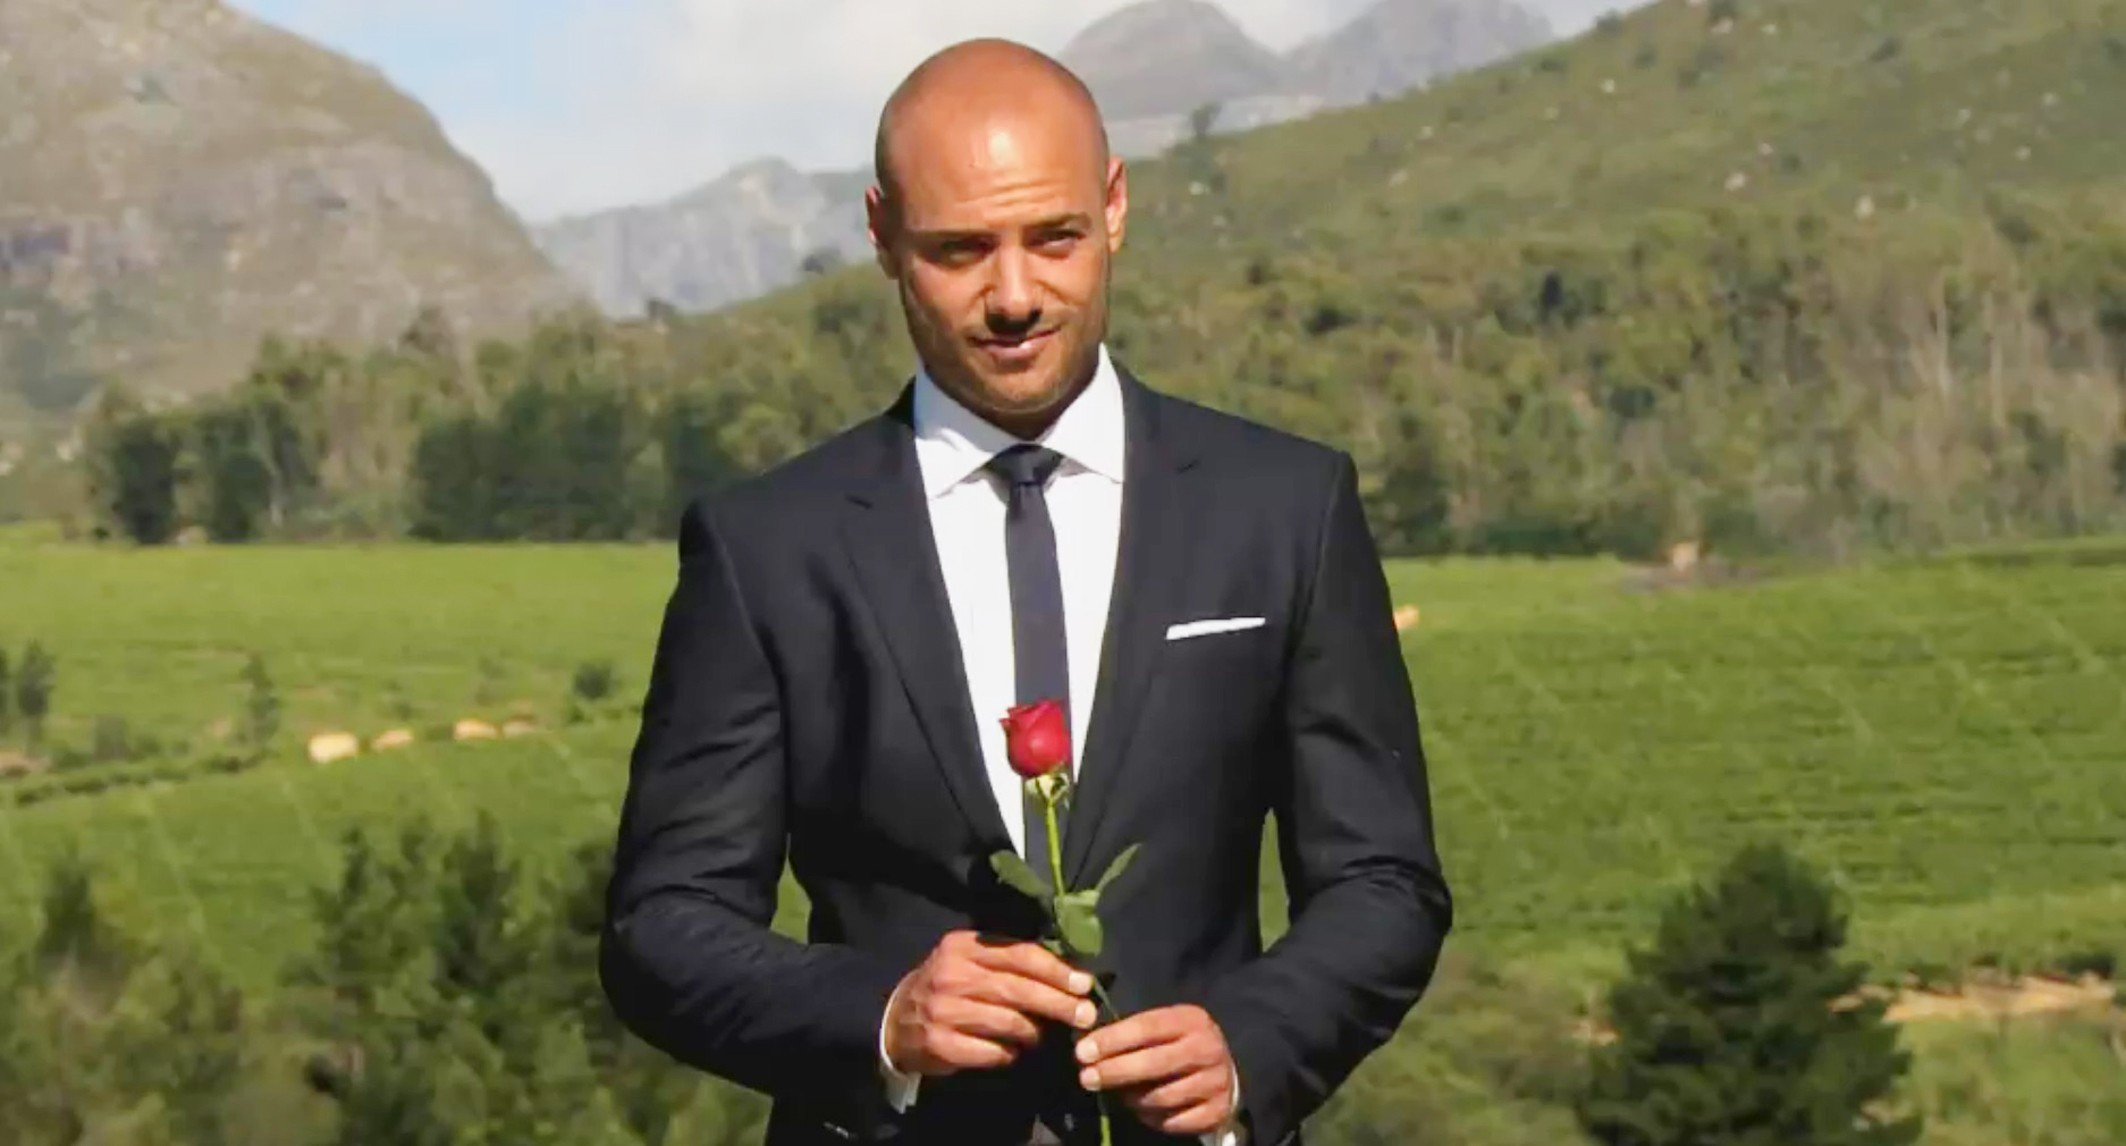 Die zehn pikantesten Bachelor-Momente